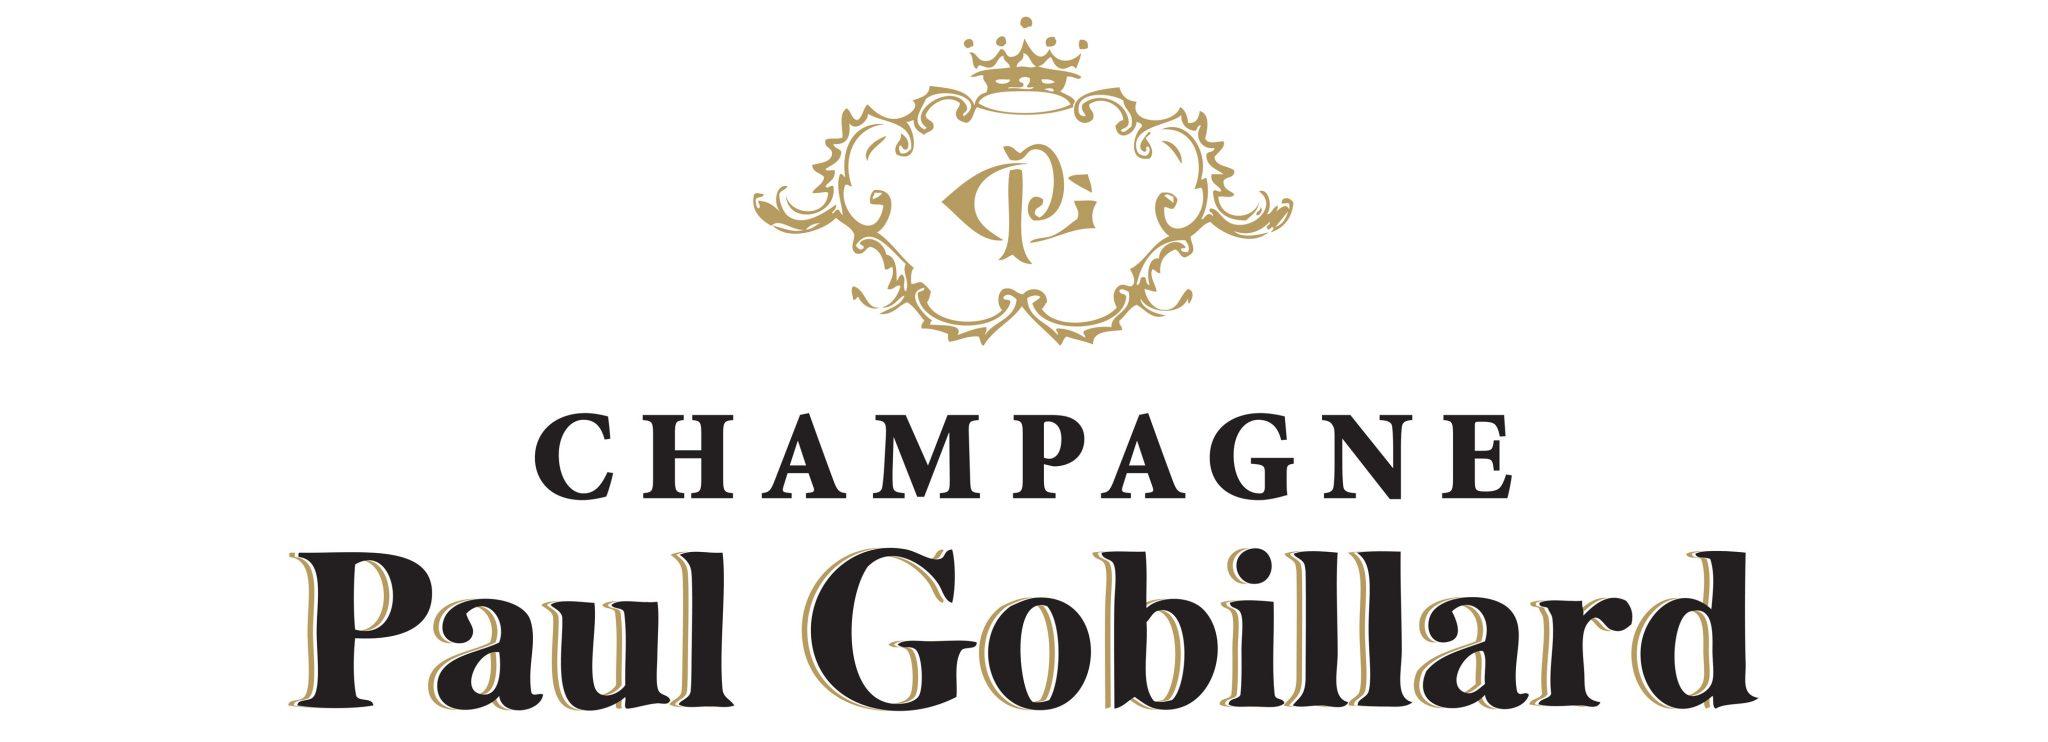 Champagne Paul Gobillard